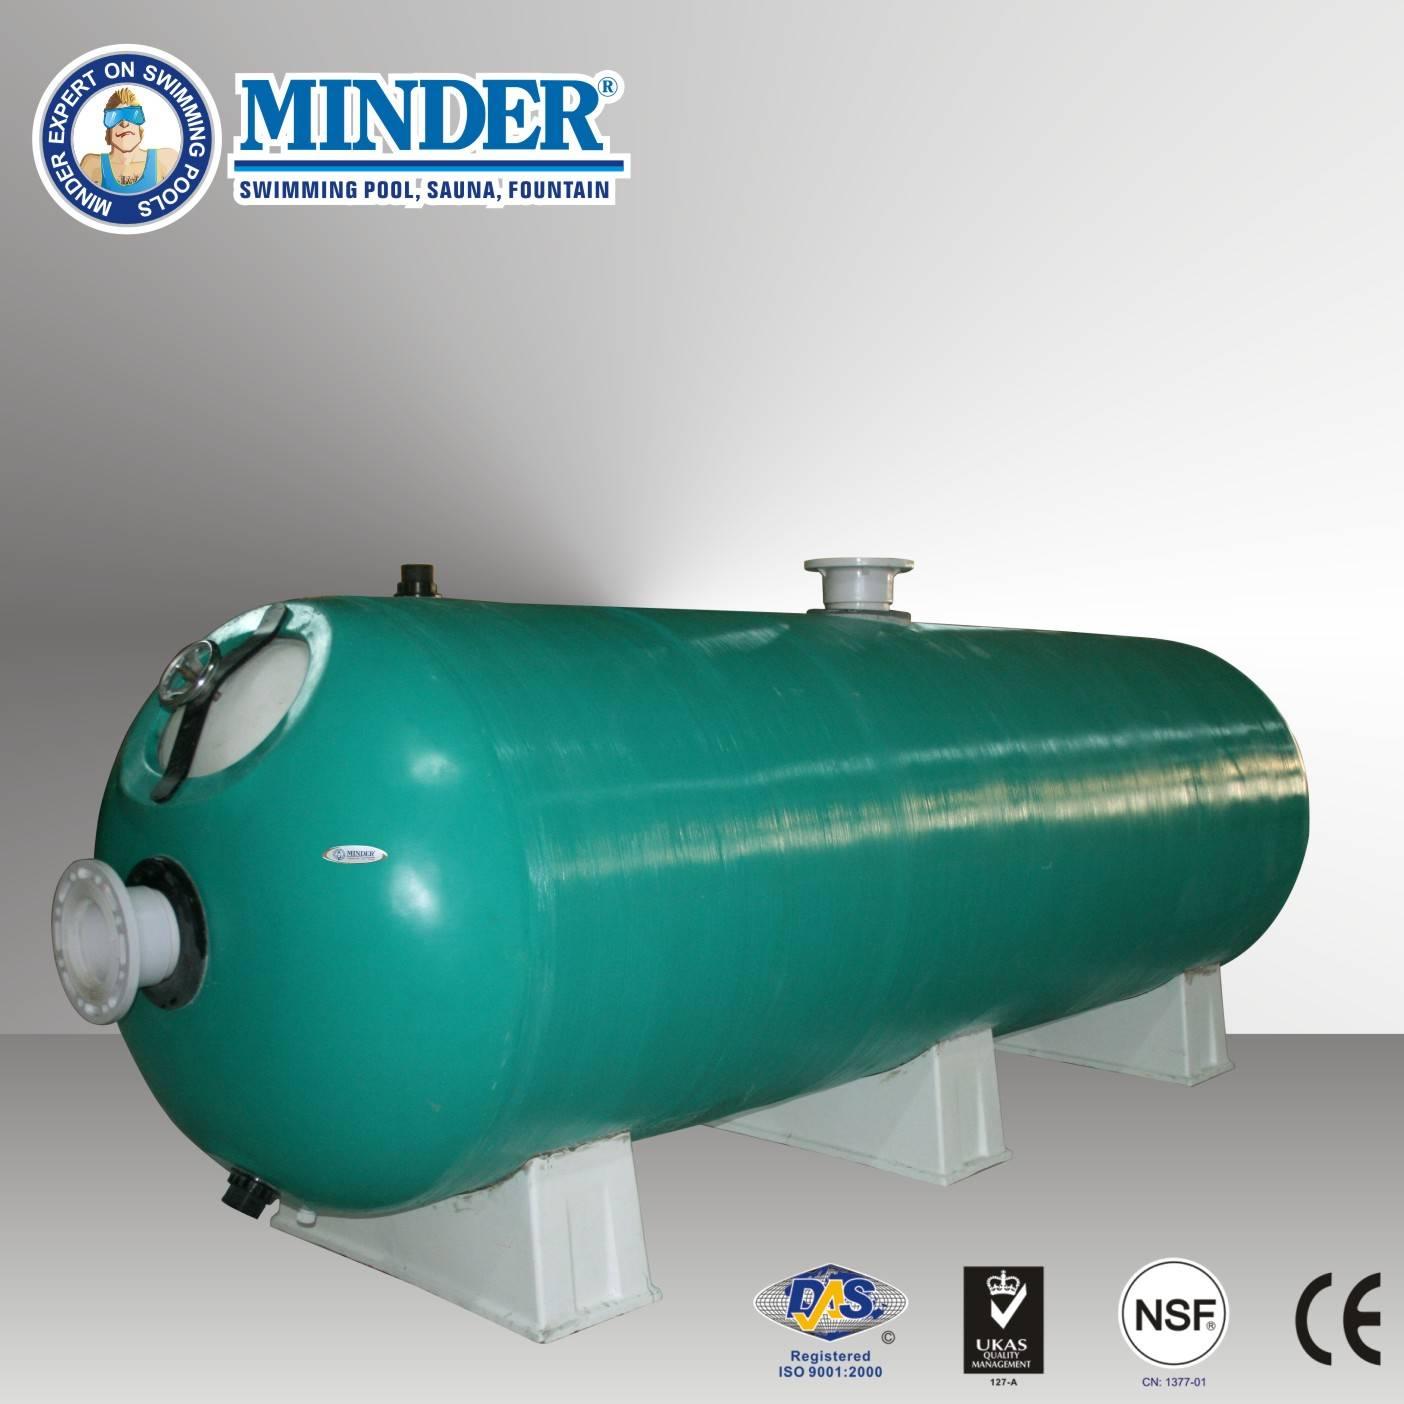 pool filter, swimming pool filter, water filter system